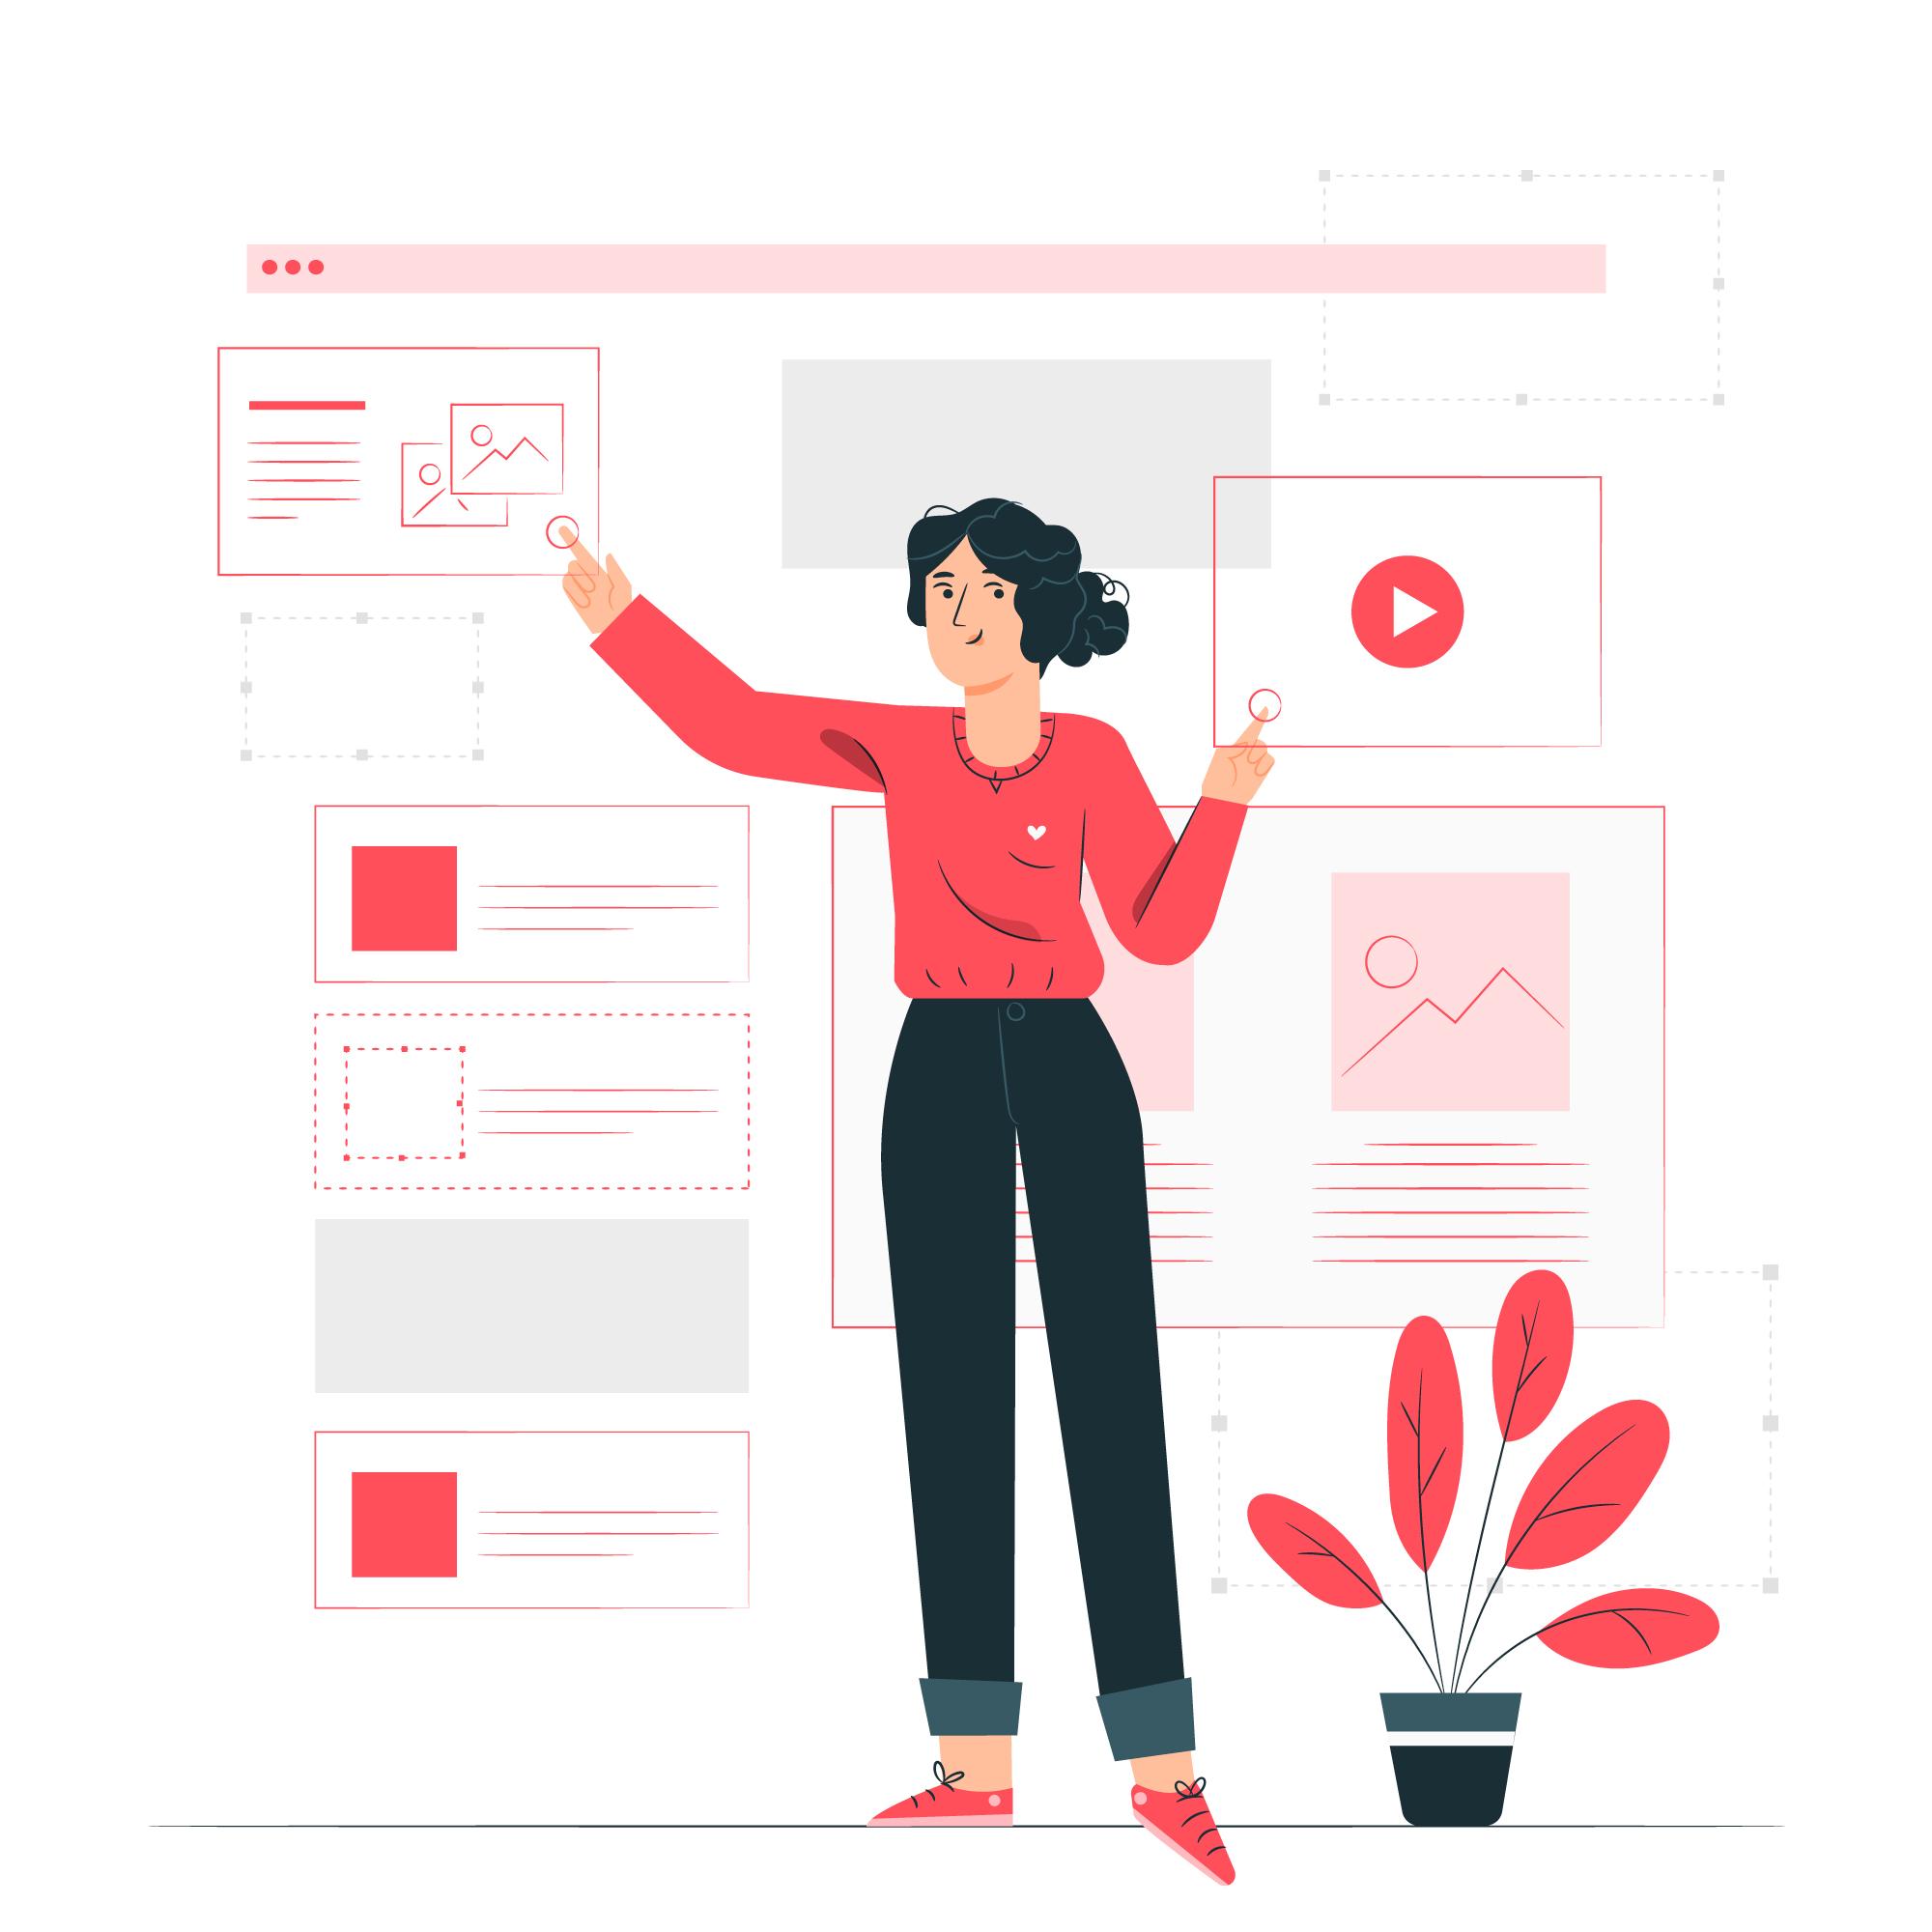 e-commerce step 1